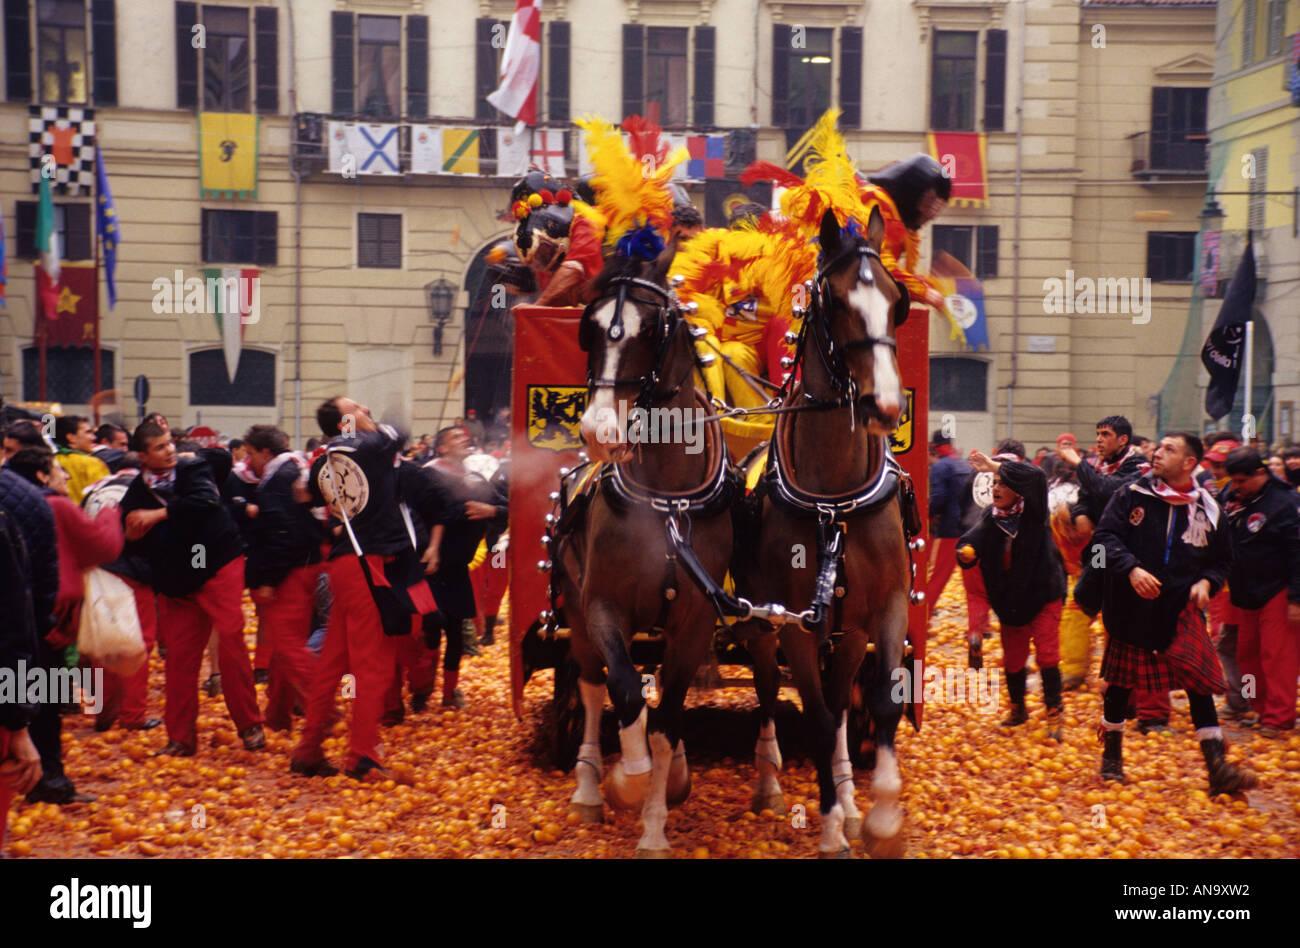 orange battle at the carnival of ivrea italy stock photo 8834321 alamy. Black Bedroom Furniture Sets. Home Design Ideas